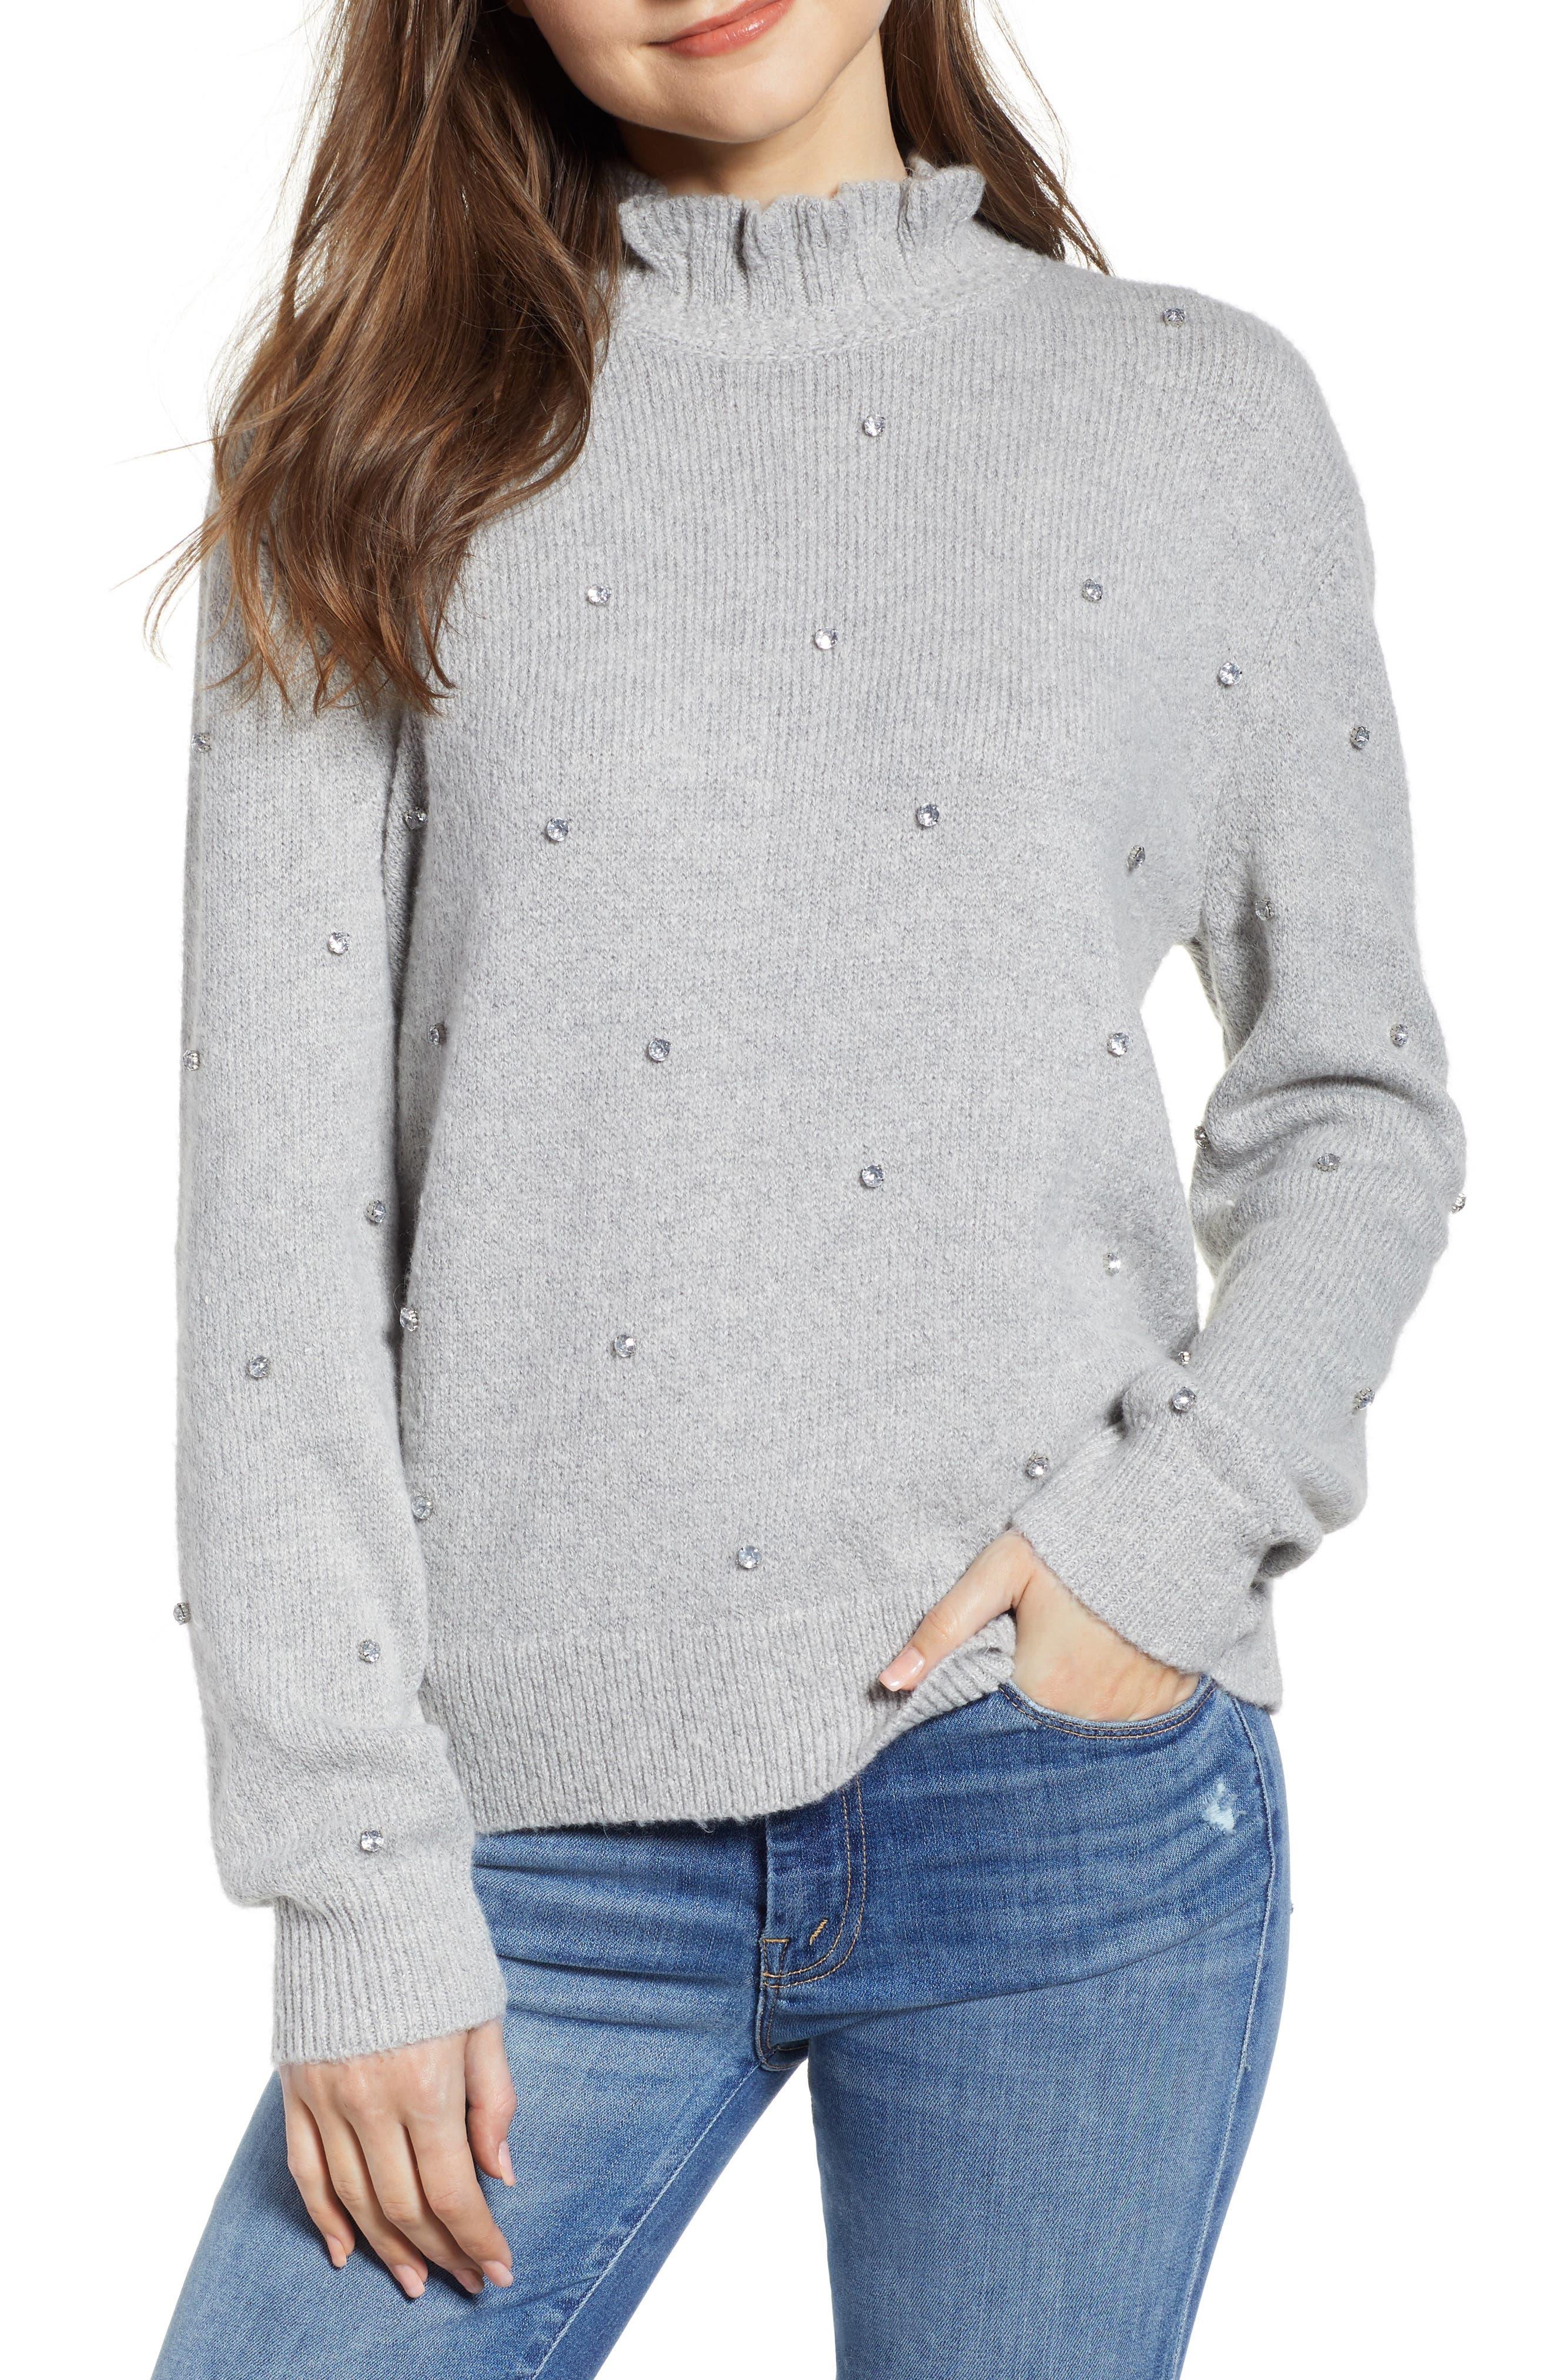 Embellished Ruffle Neck Sweater,                             Main thumbnail 1, color,                             GREY LIGHT HEATHER